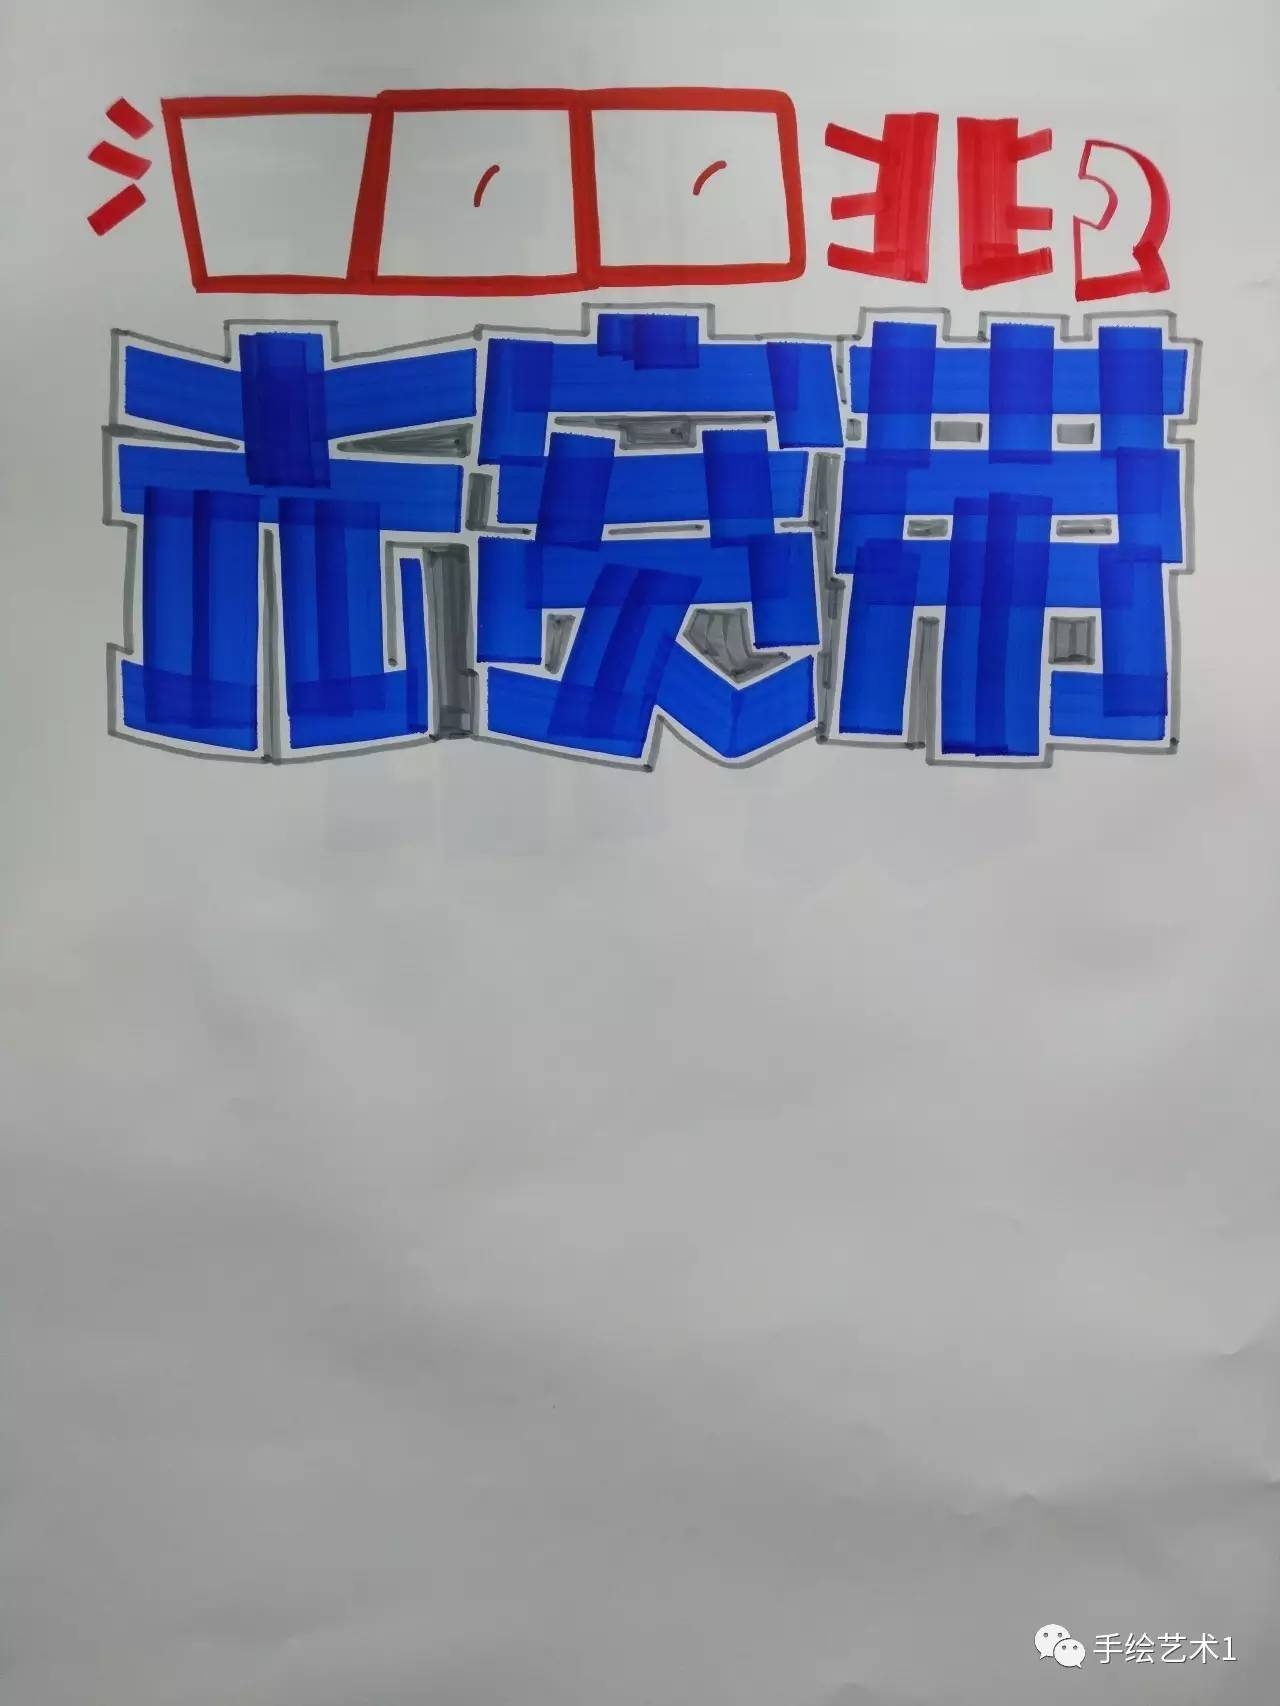 【pop教程】教您绘制宽带海报的分解,您准备好了吗?